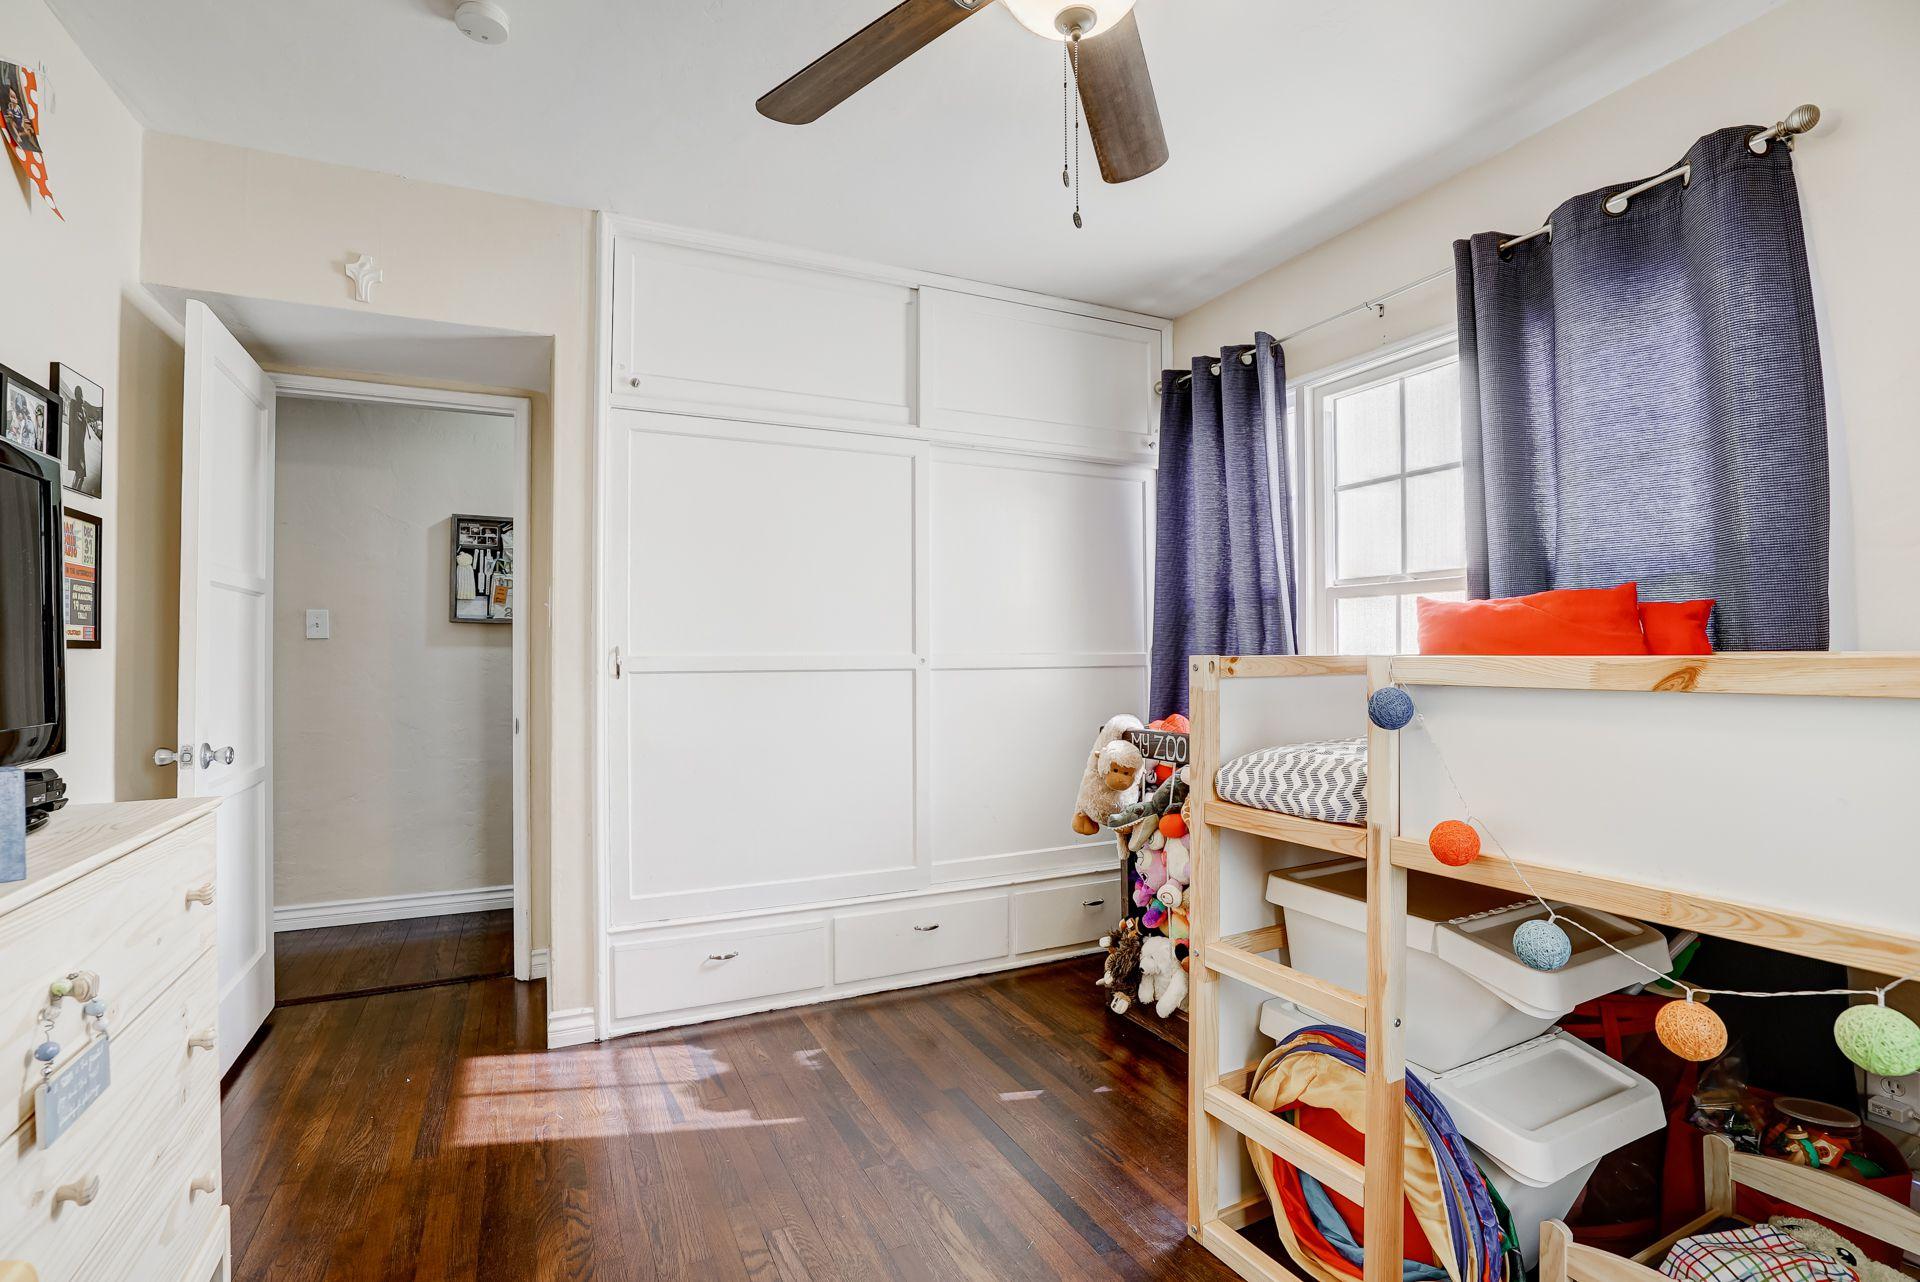 Wonderful closet space in back bedroom.